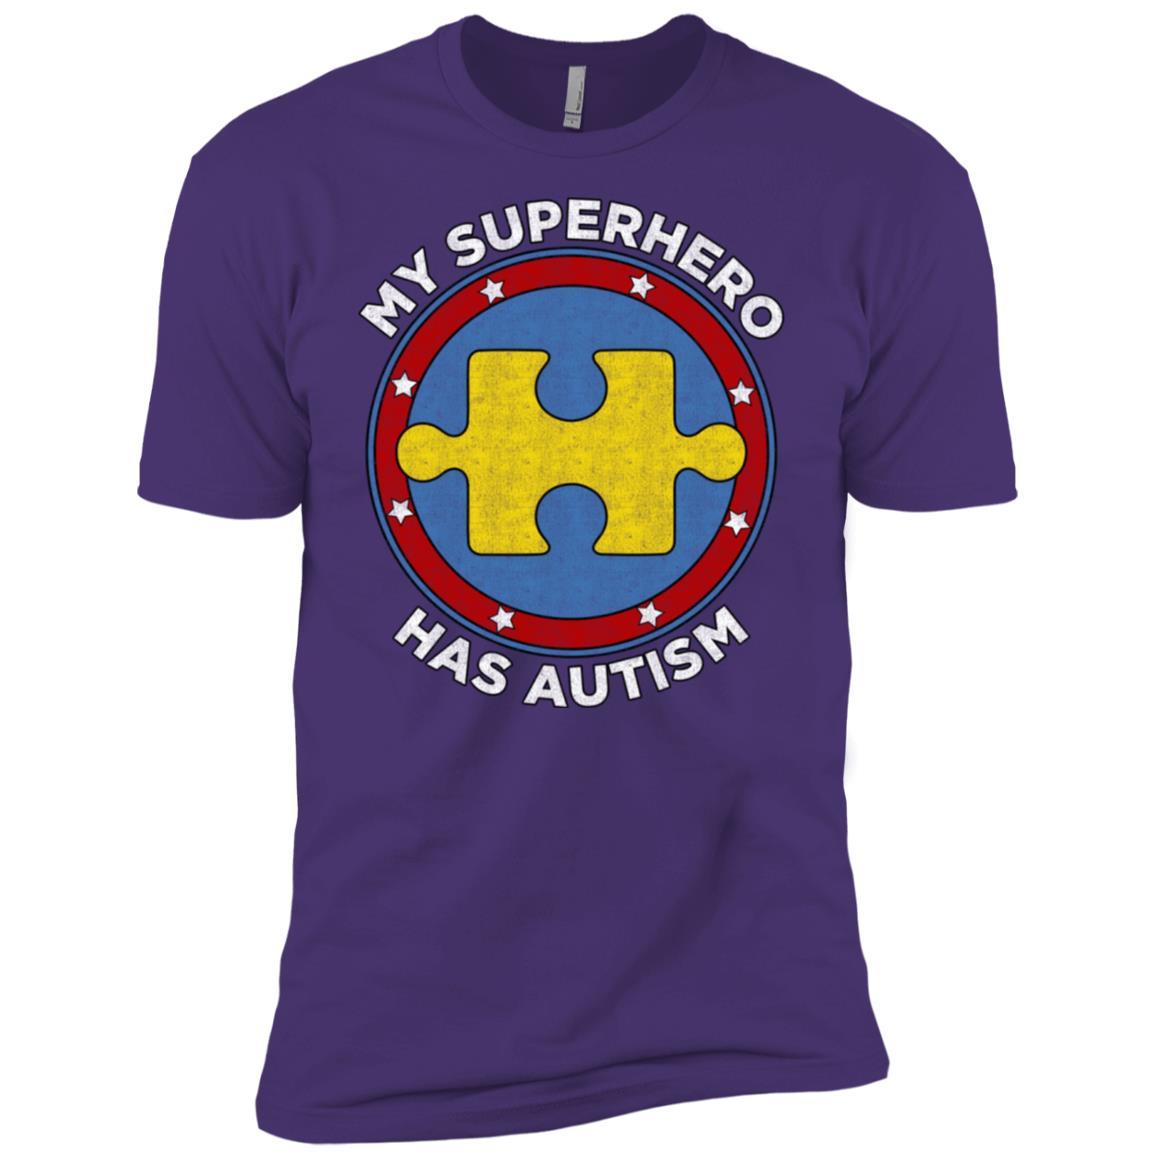 My Superhero Has Autism Awareness Support Men Short Sleeve T-Shirt